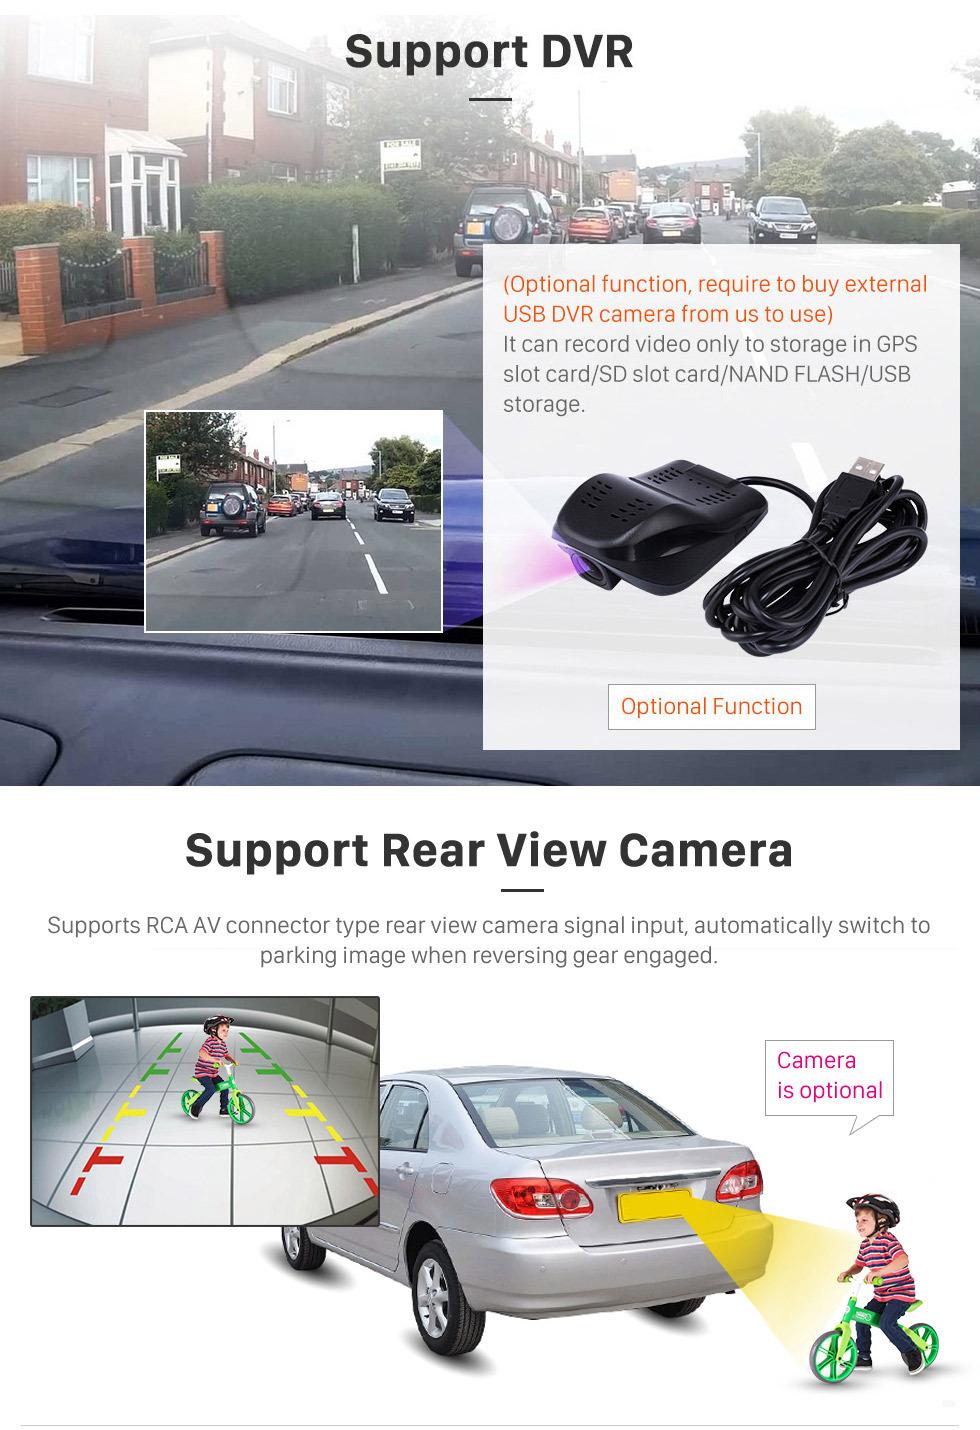 Seicane 9 pulgadas Android 8.1 2011-2016 Renault Captur CLIO Samsung QM3 Manual A / C Navegación GPS Sistema de audio para automóvil Pantalla táctil AM Radio FM Música Bluetooth 3G WiFi OBD2 Enlace de espejo AUX Cámara de respaldo USB SD 1080P Video